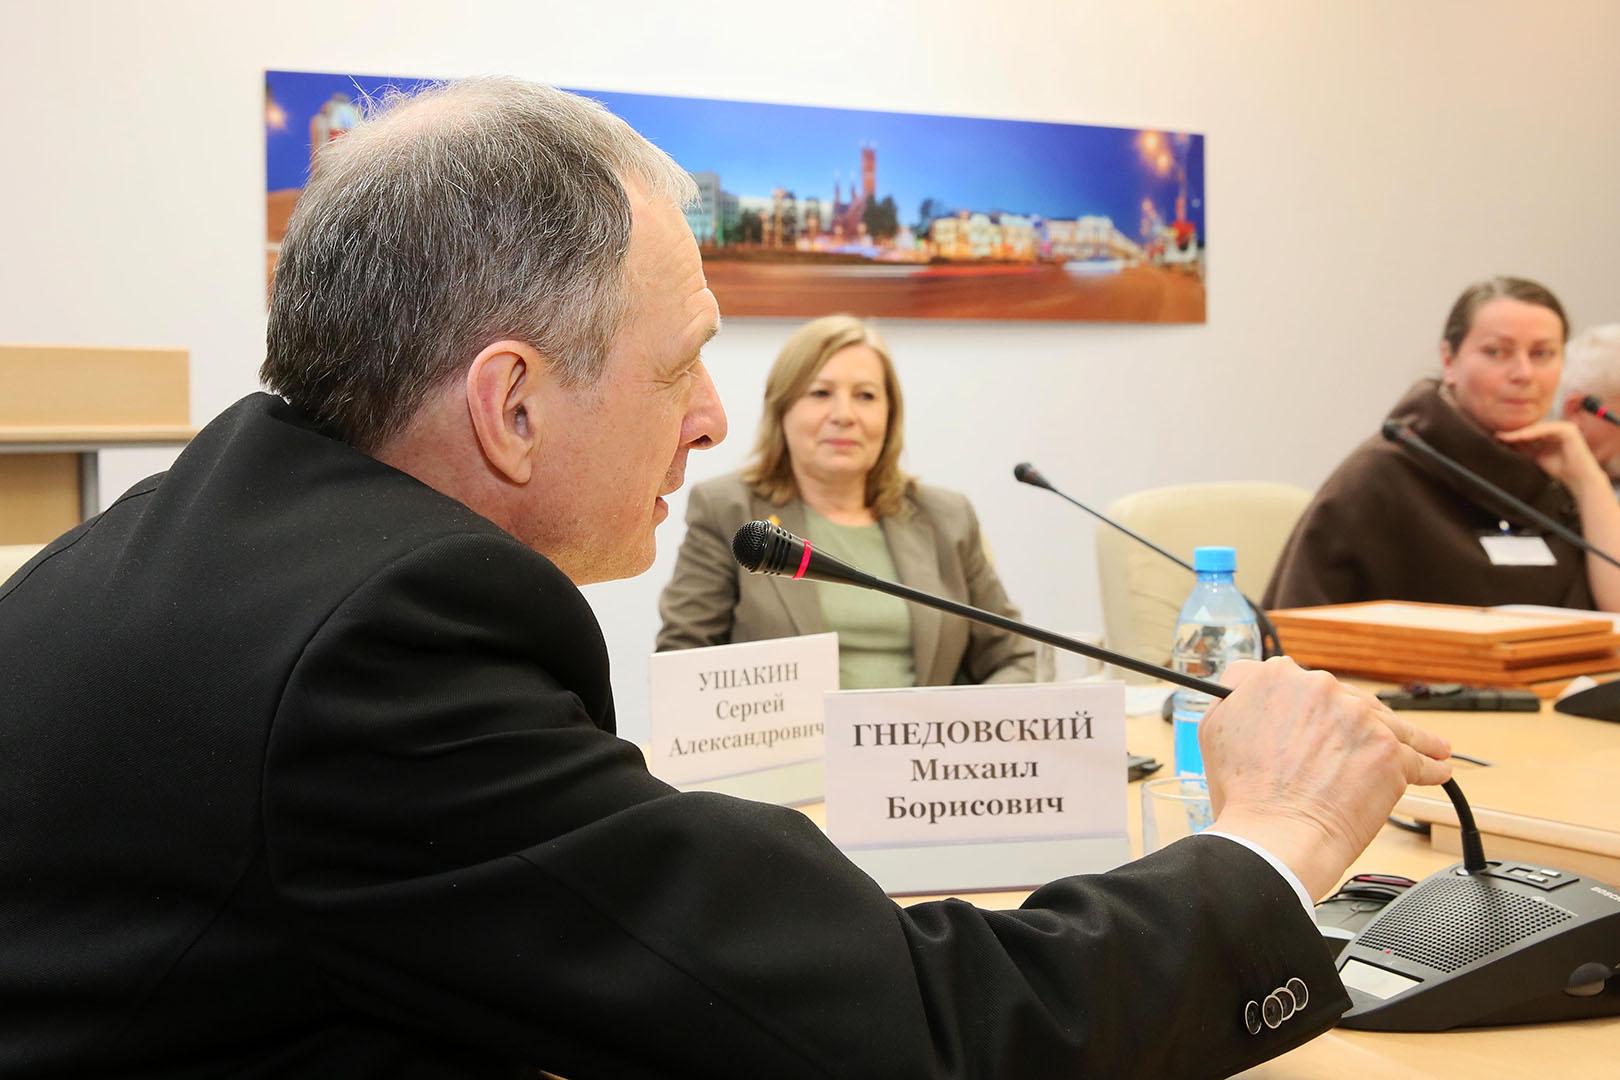 Image33_ICOM Belarus Conference 2019